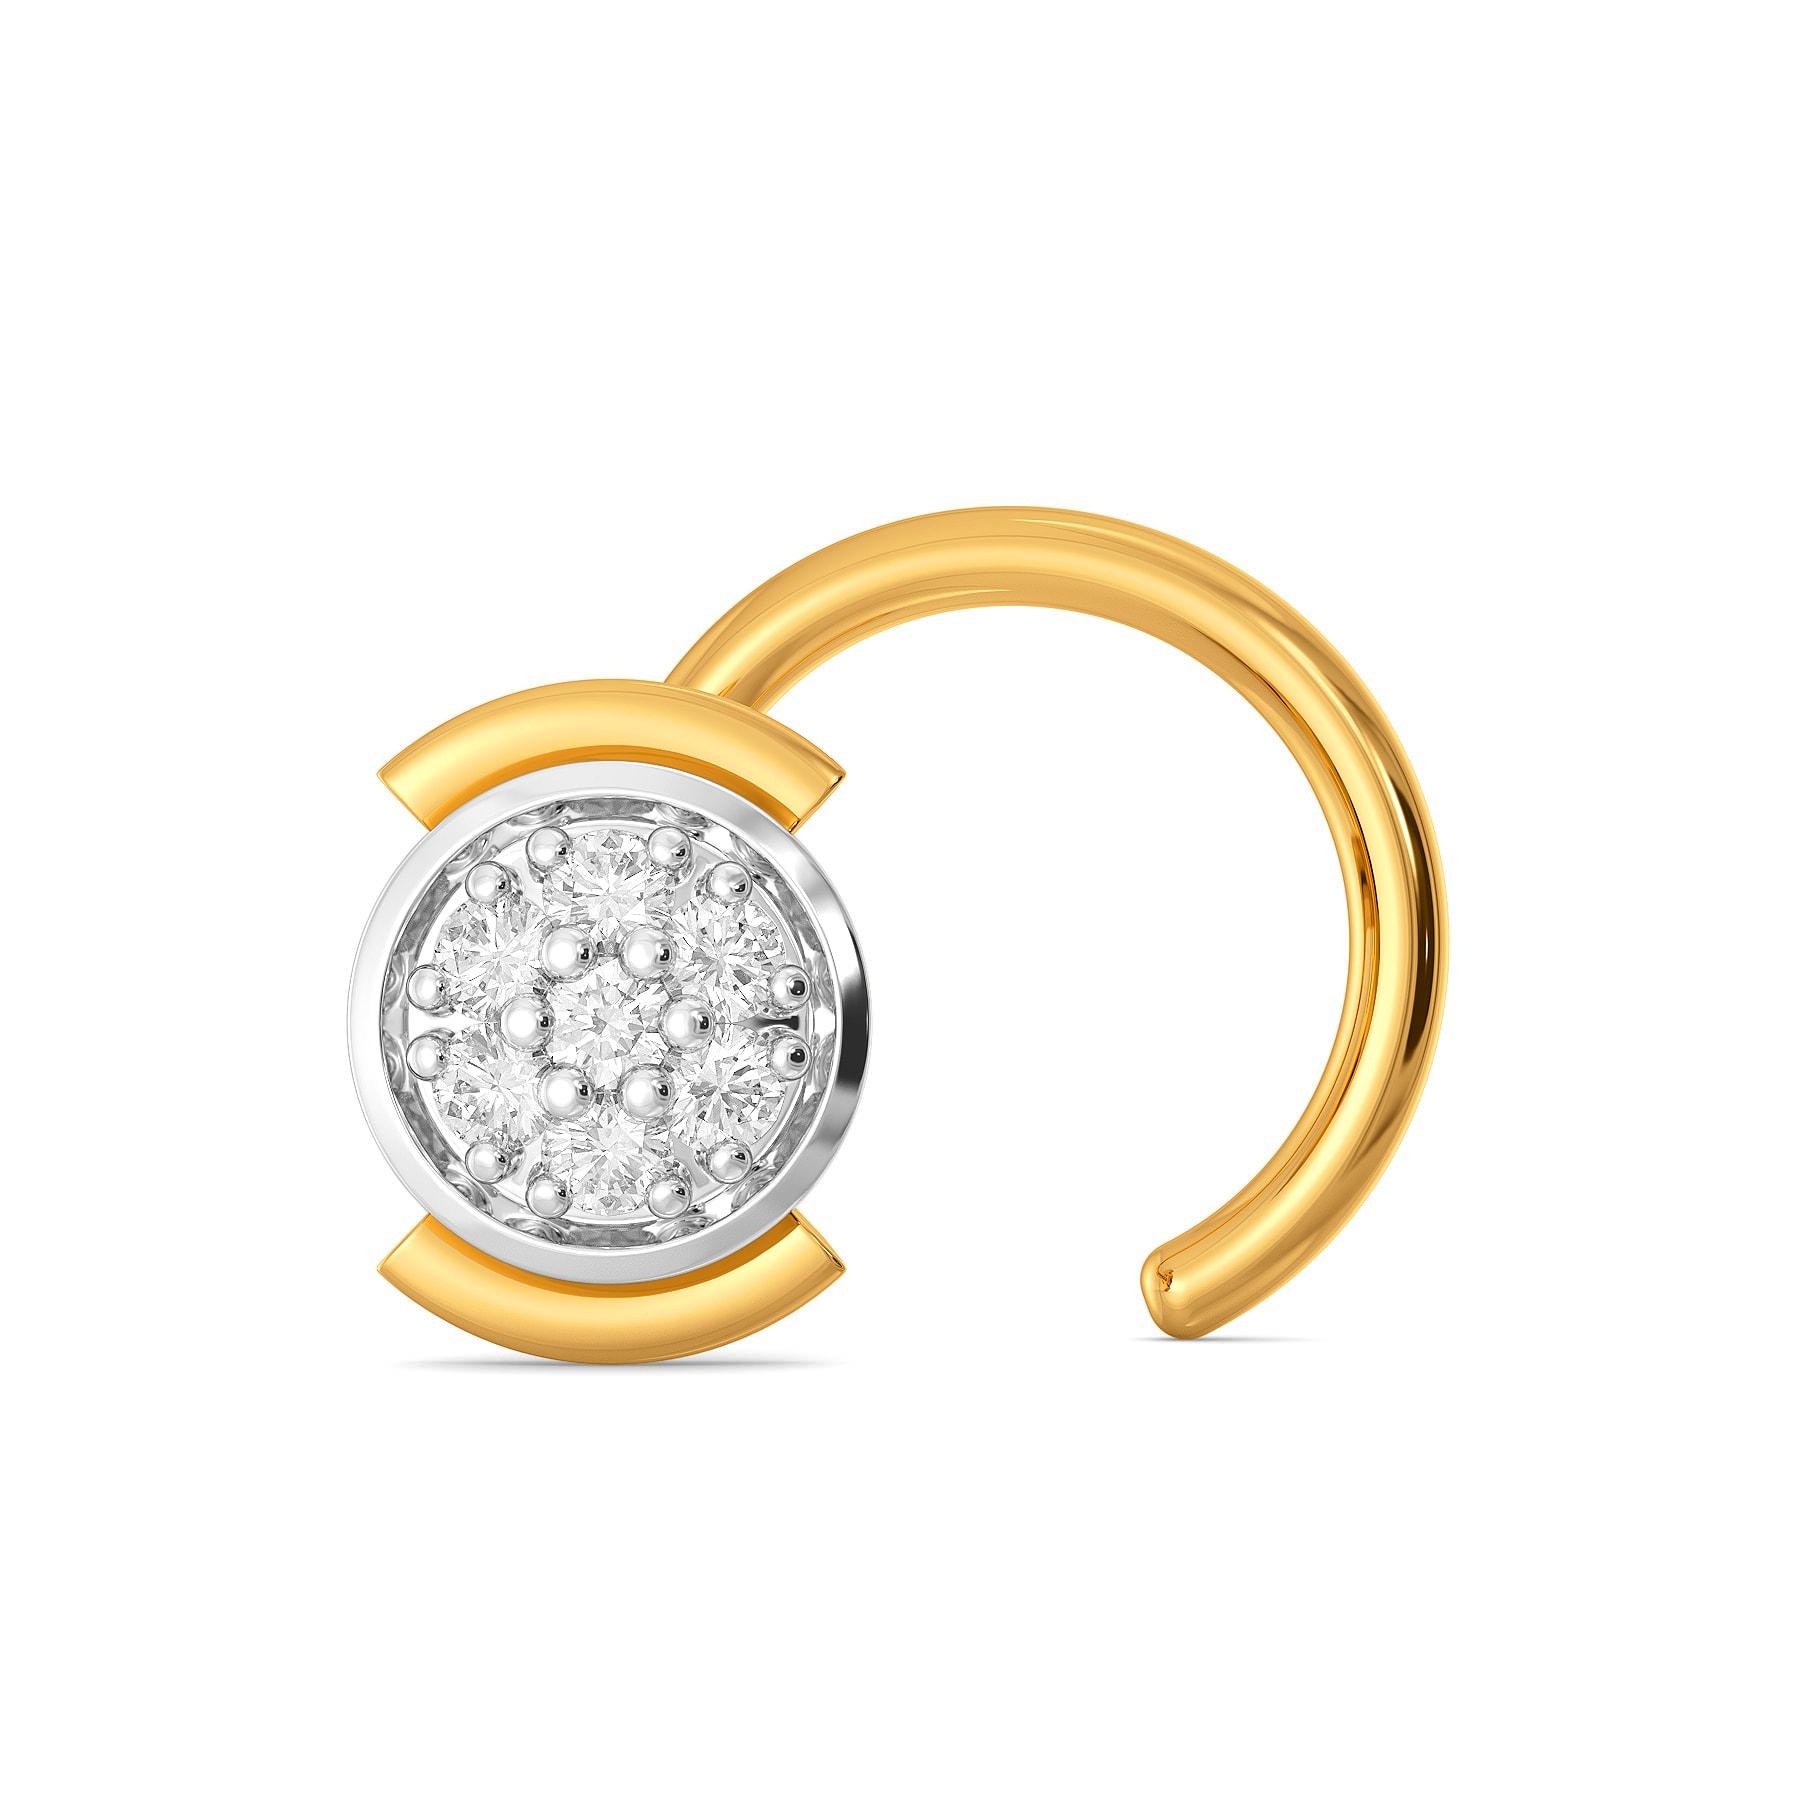 Work Vision Diamond Nose Pins